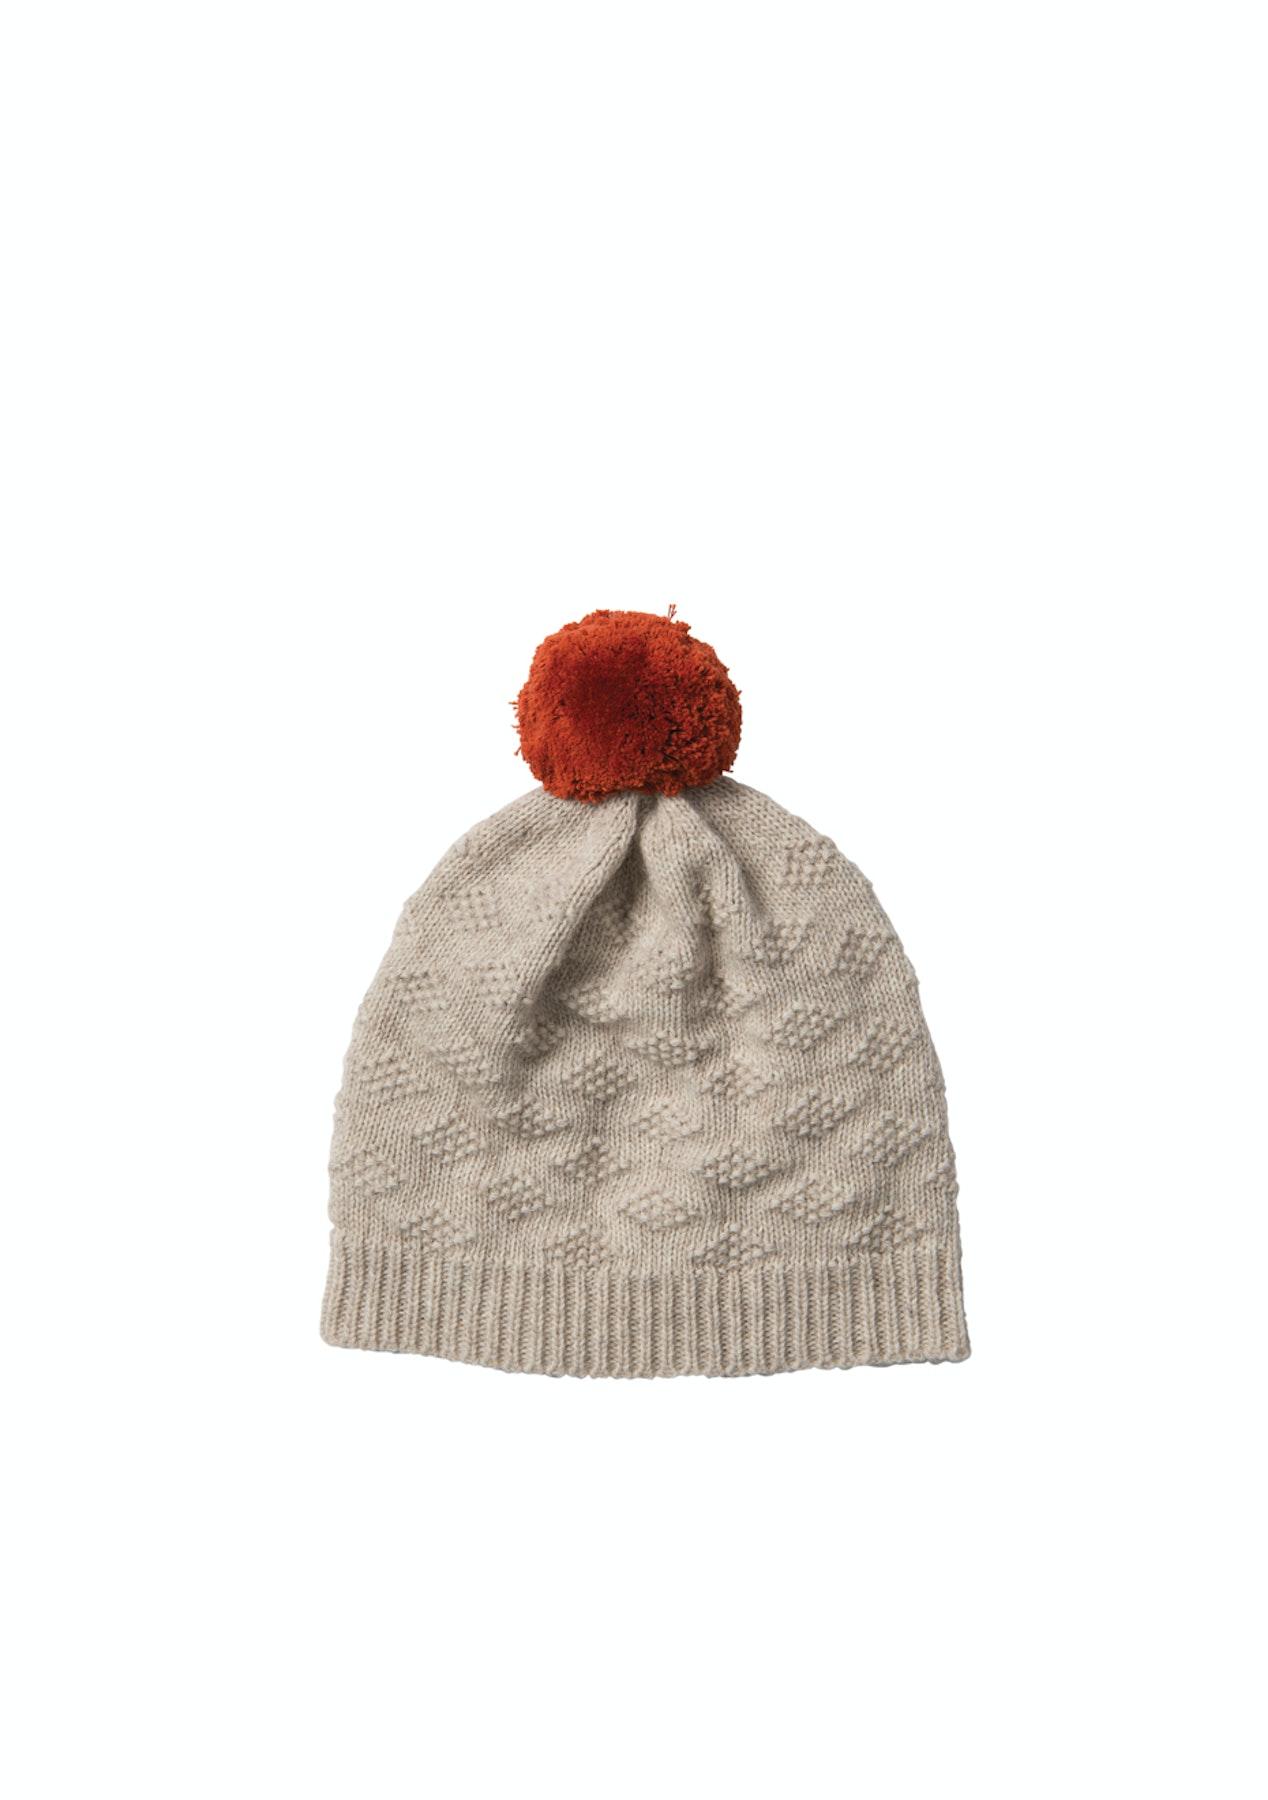 b2da20166 Citta - Pom Pom Wool Blend Beanie Nougat/Carmine OS